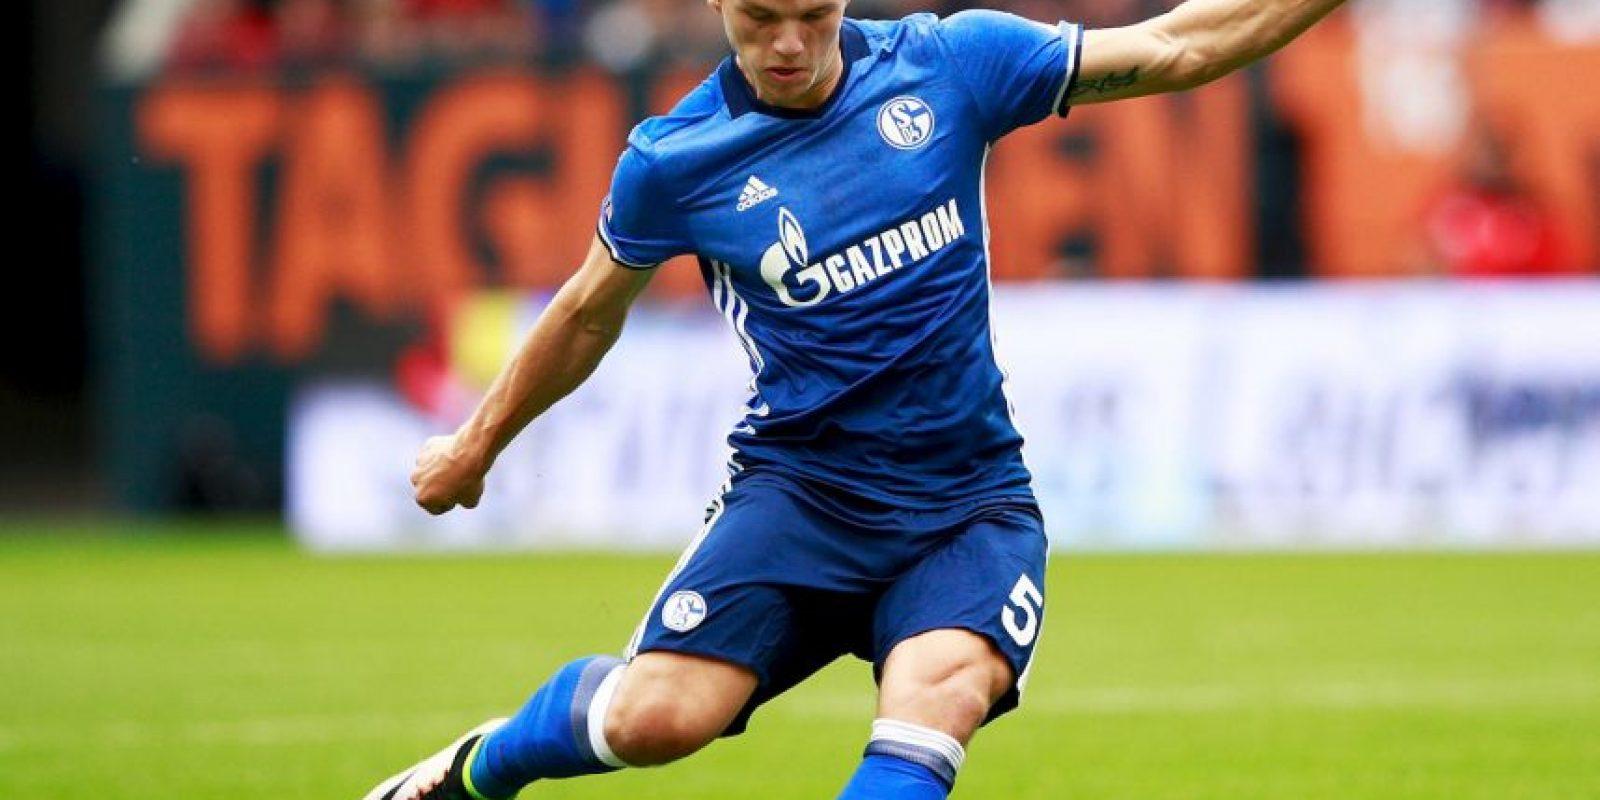 18.Schalke 04-Bundesliga(184.000 camisetas vendidas – Adidas) Foto:Getty Images